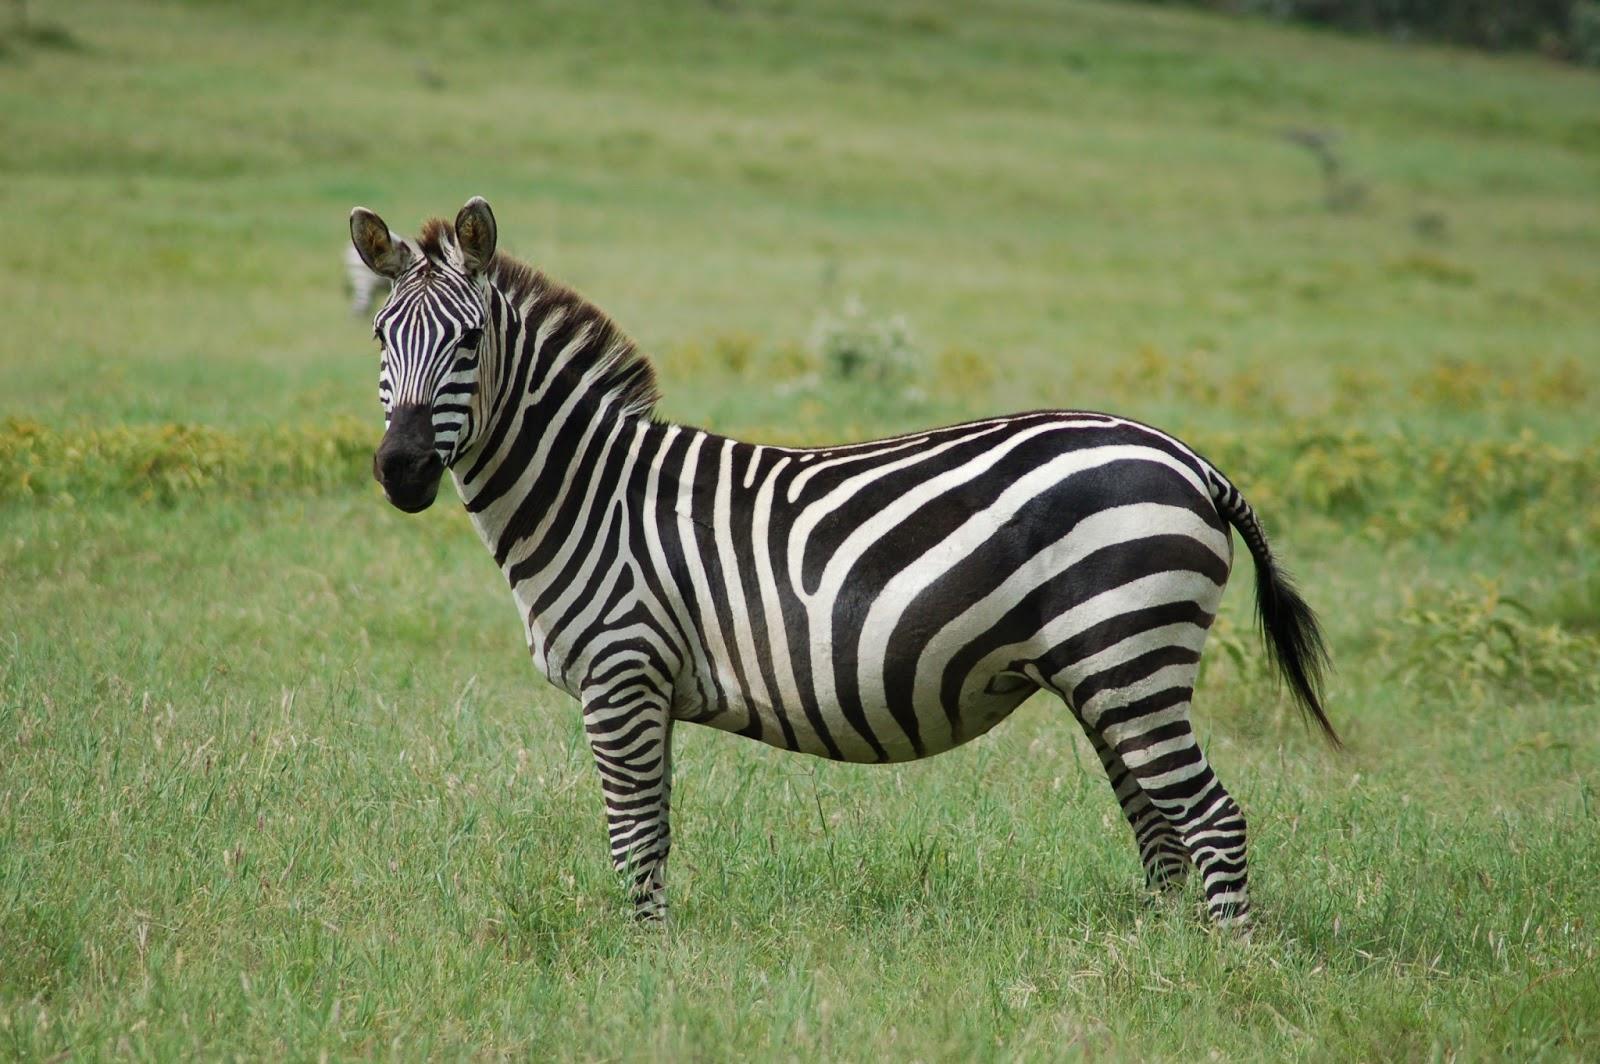 zebra animals zebras animal lover habitat facts plains grant quagga african female grants equus its zabra interesting wikipedia horse stripes